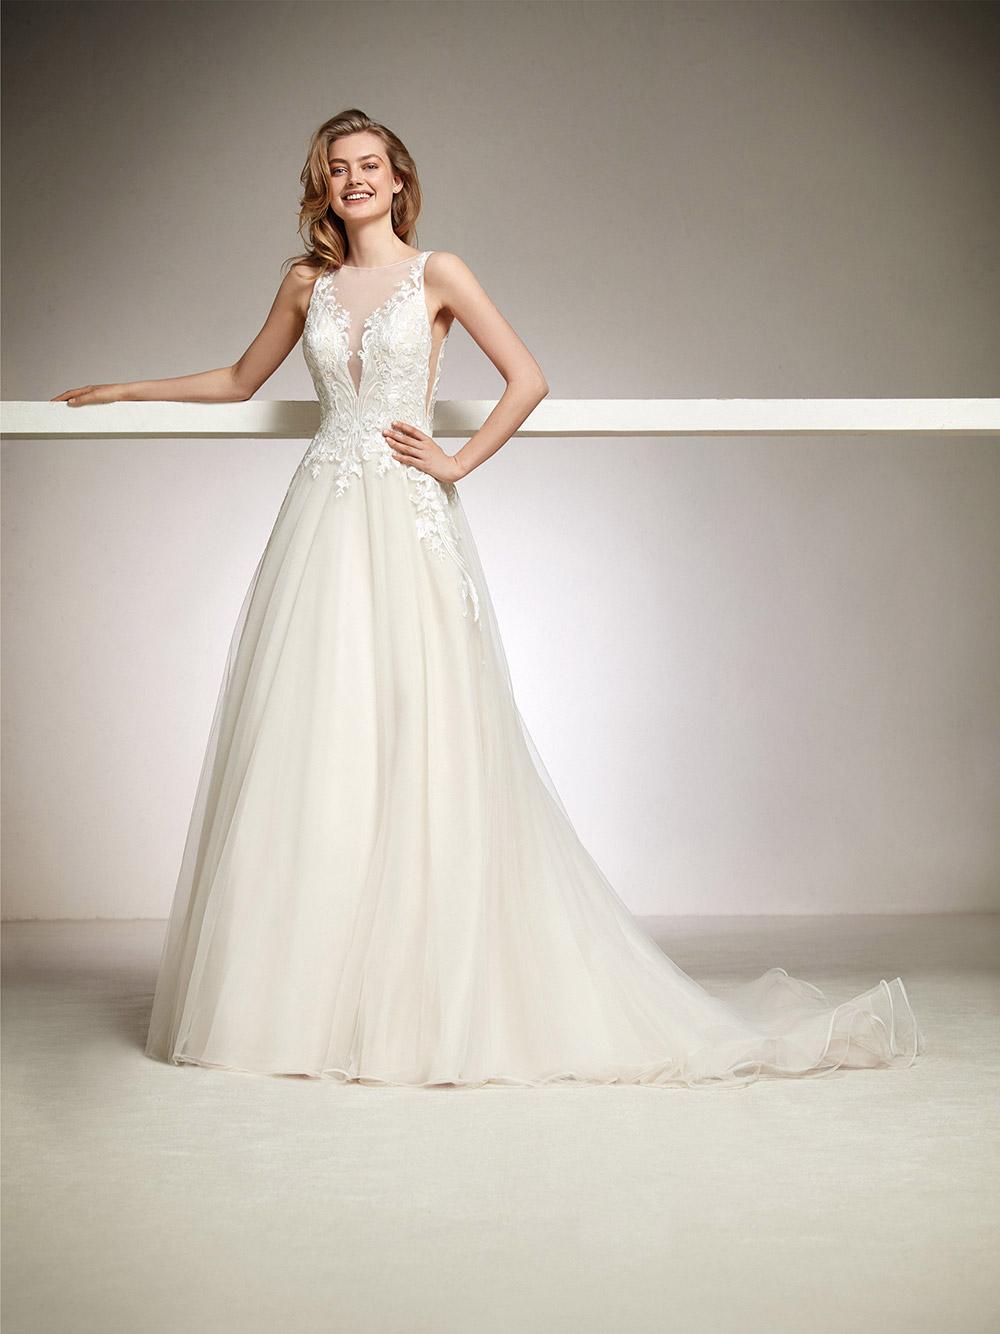 Doha - Pronovias 2018 Bridal Collection. www.theweddingnotebook.com